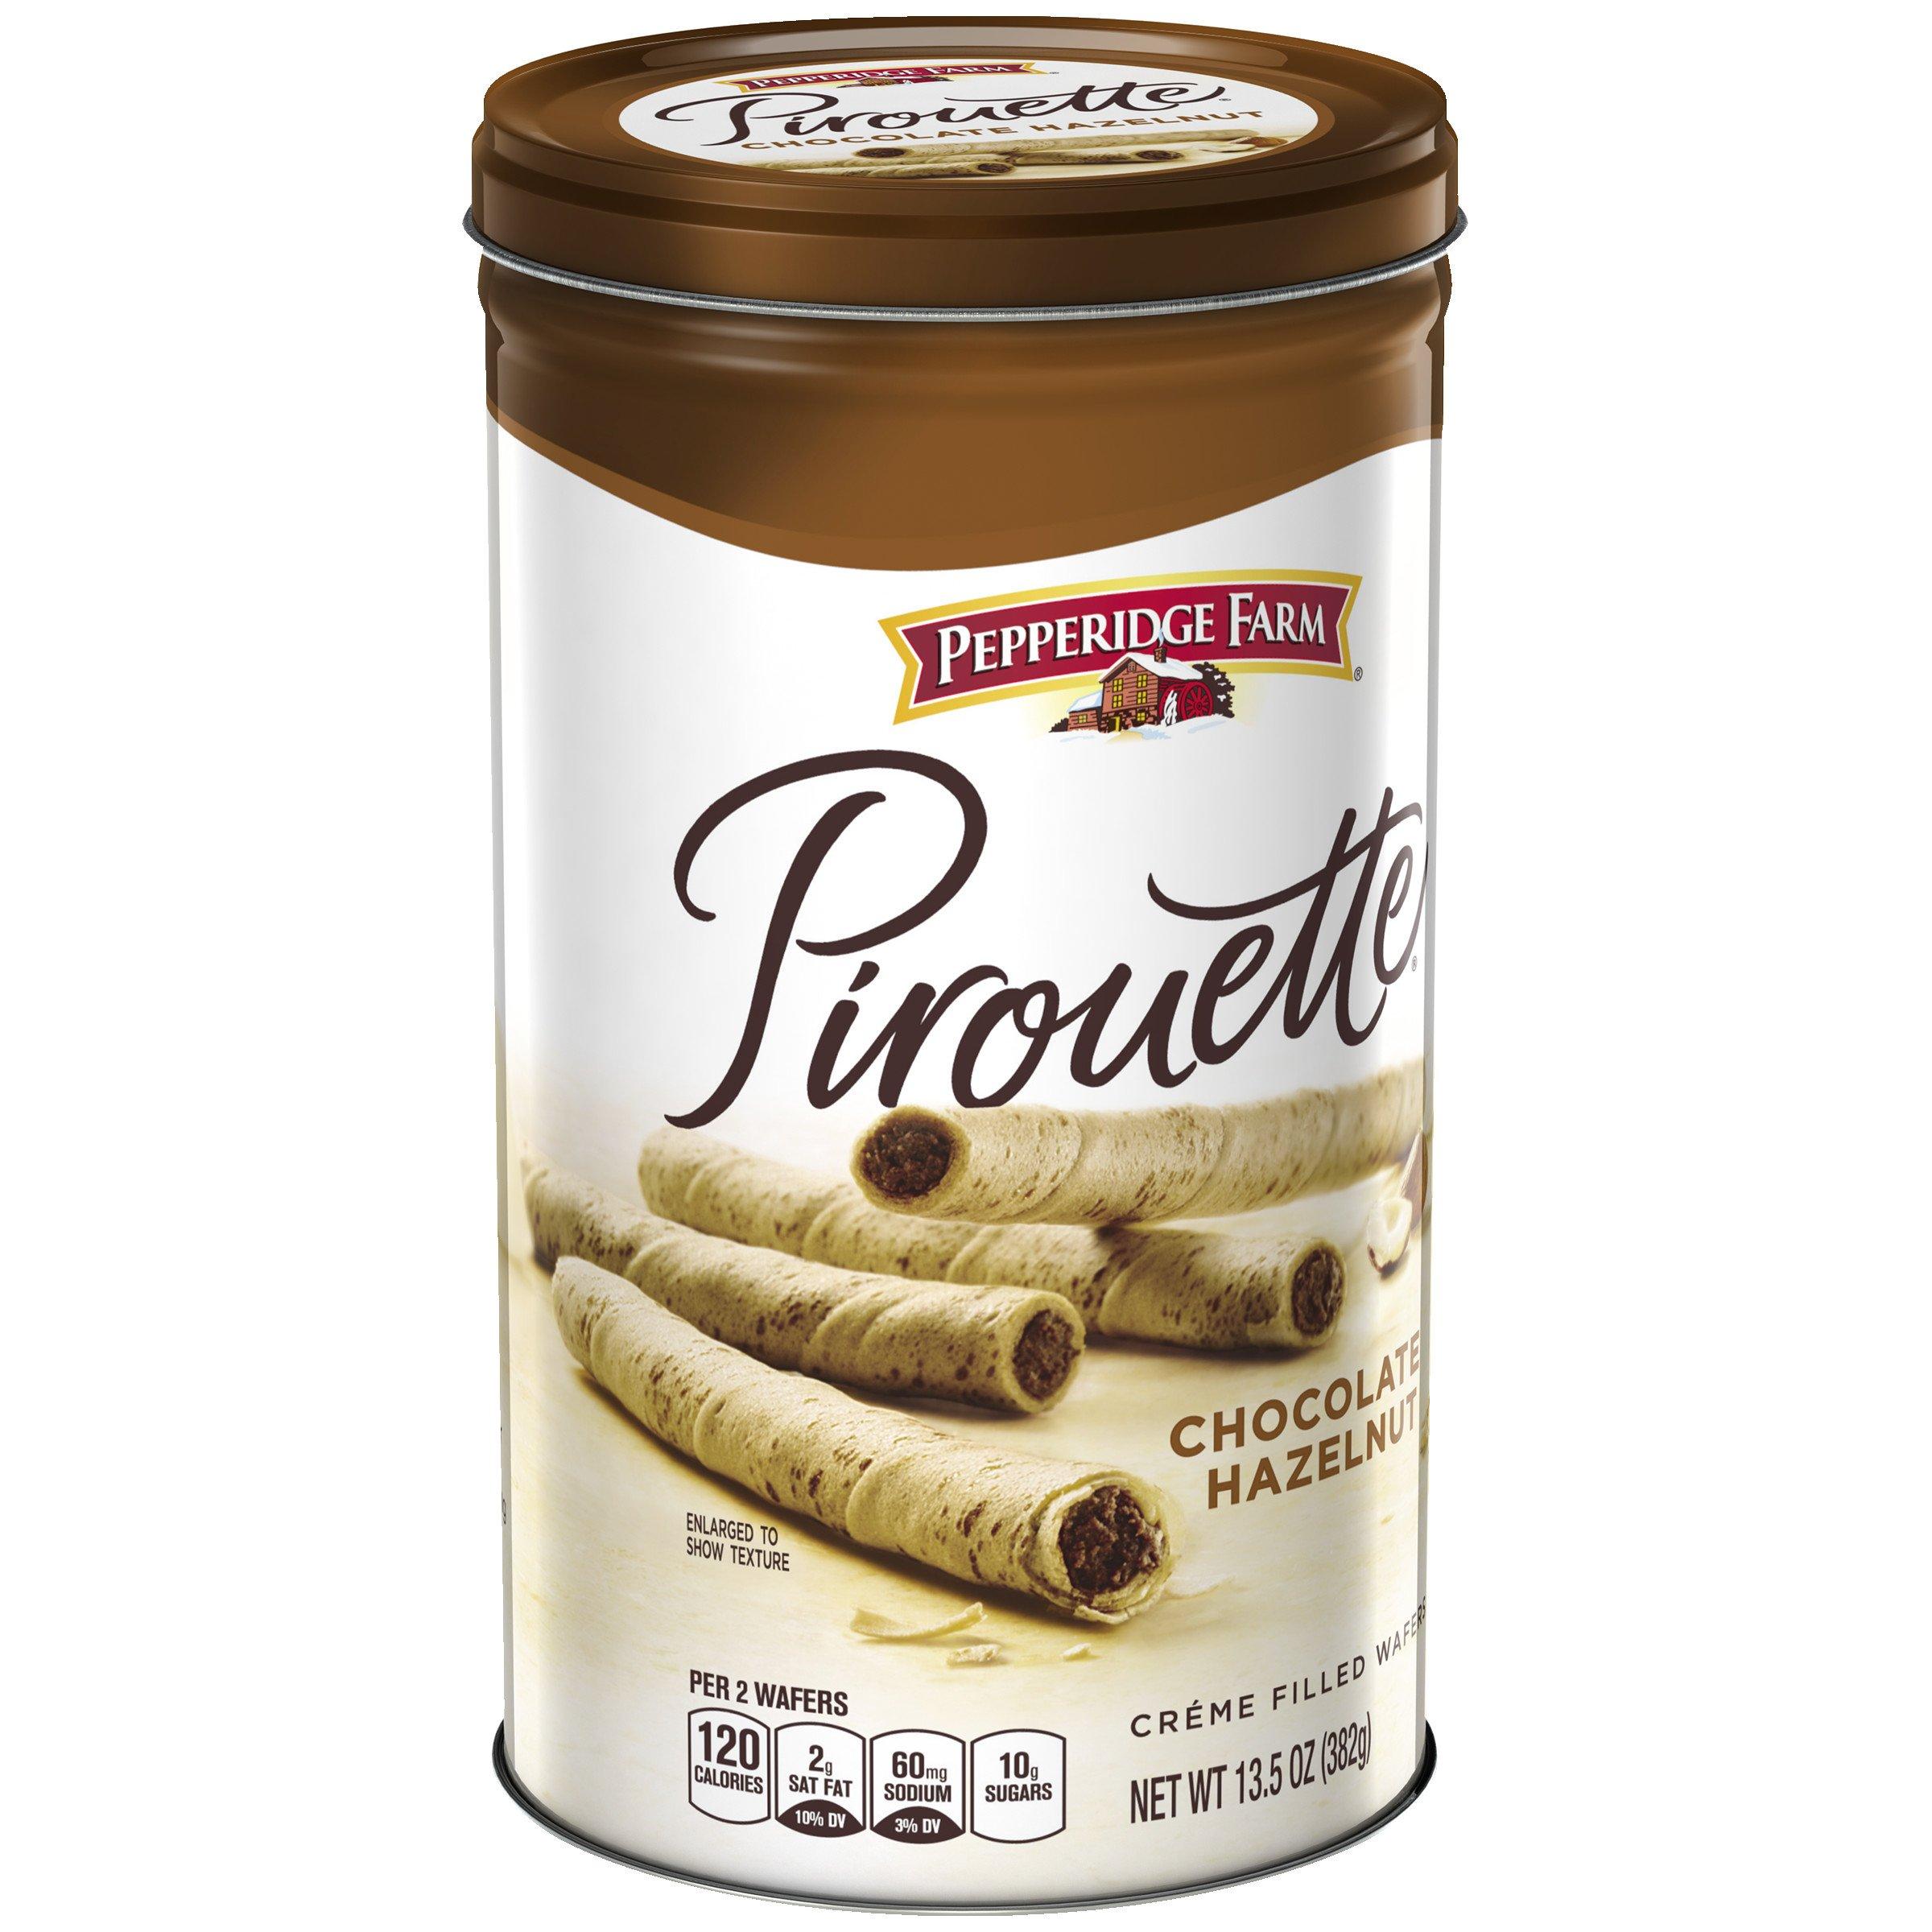 Pepperidge Farm, Pirouettes, Cookies, Chocolate Hazelnut, 13.5 oz, Tin